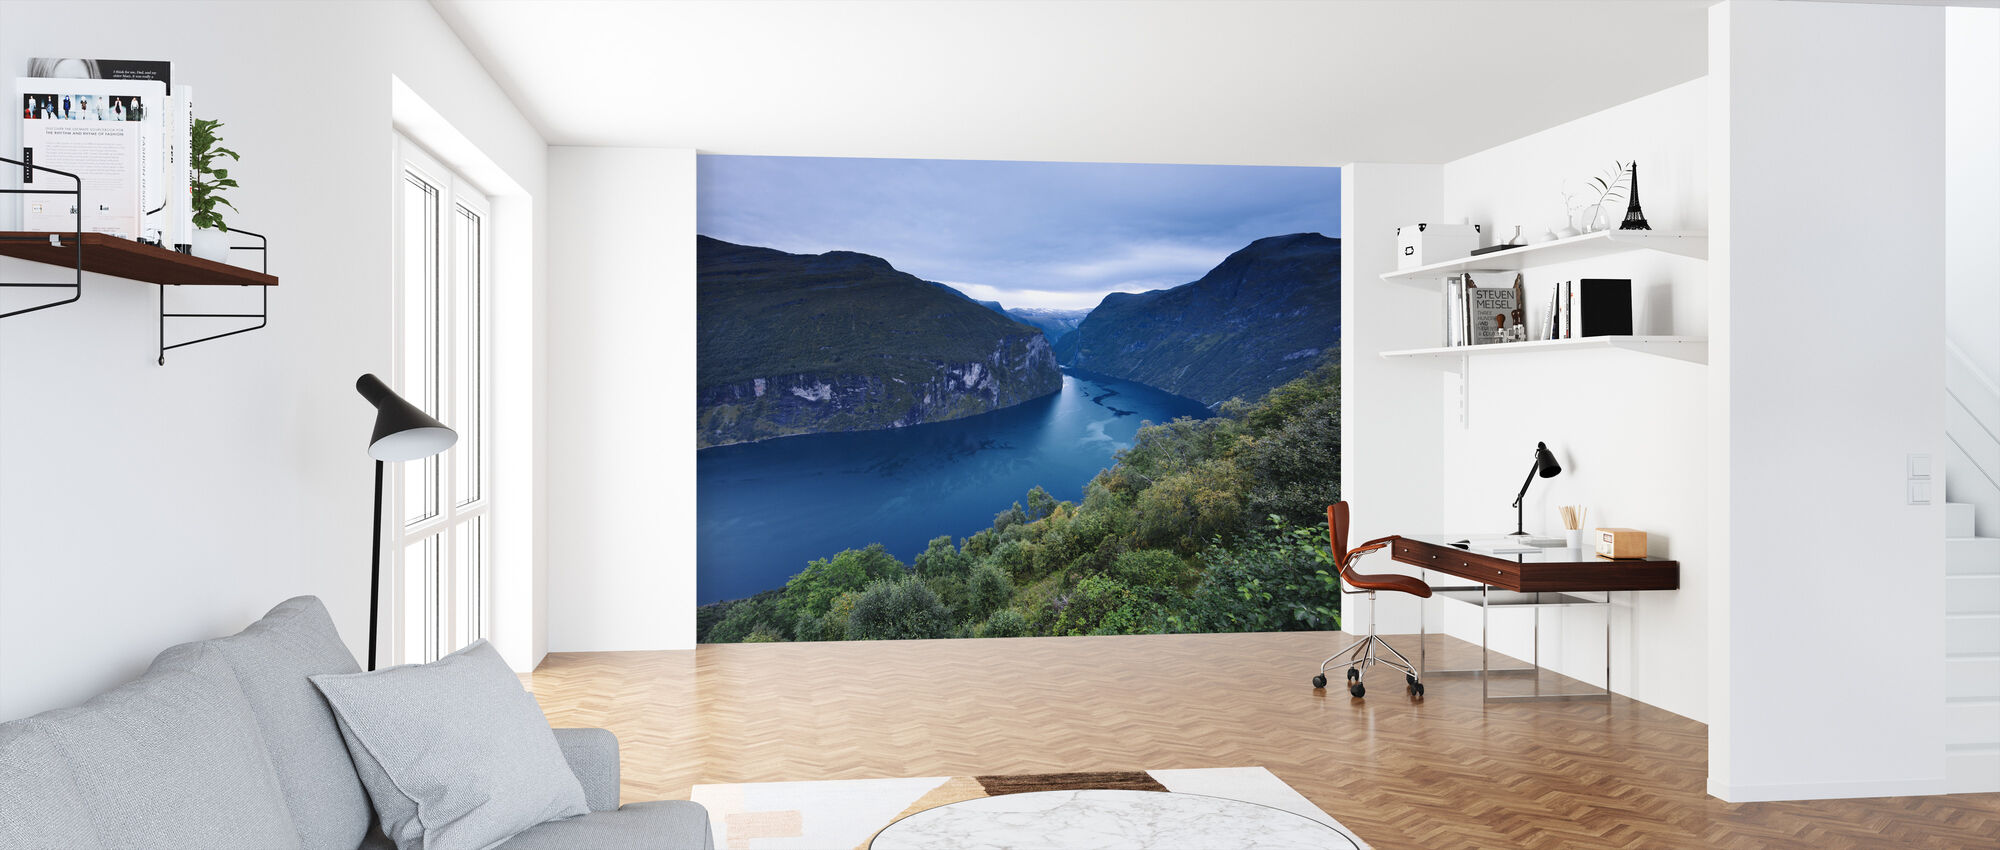 Blue Hour at Geiranger Fjord - Wallpaper - Office